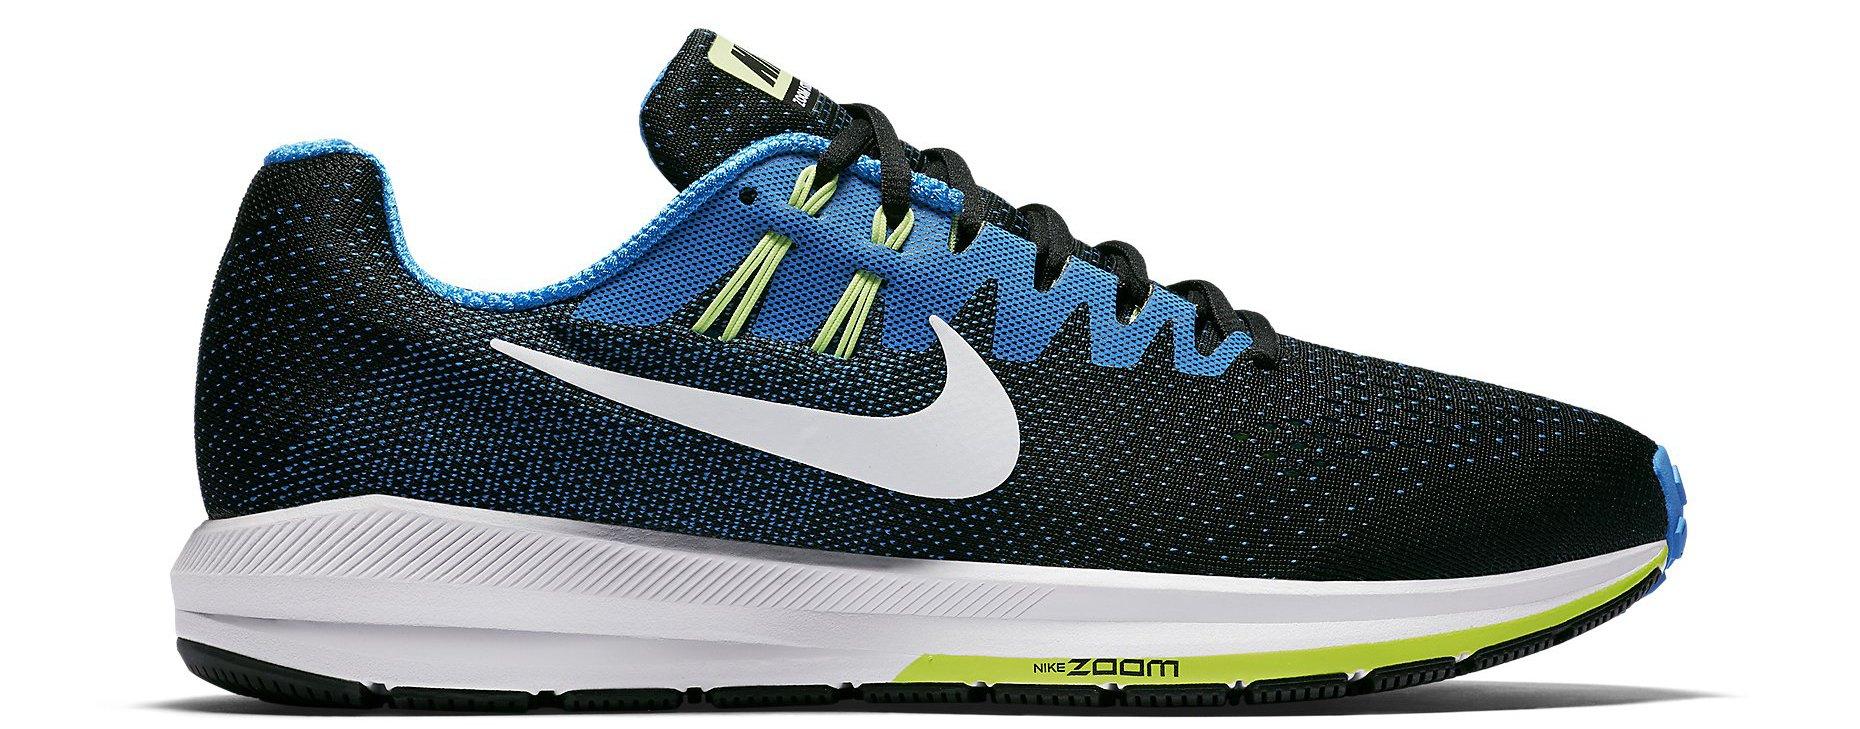 Běžecká obuv Nike Air Zoom Structure 20